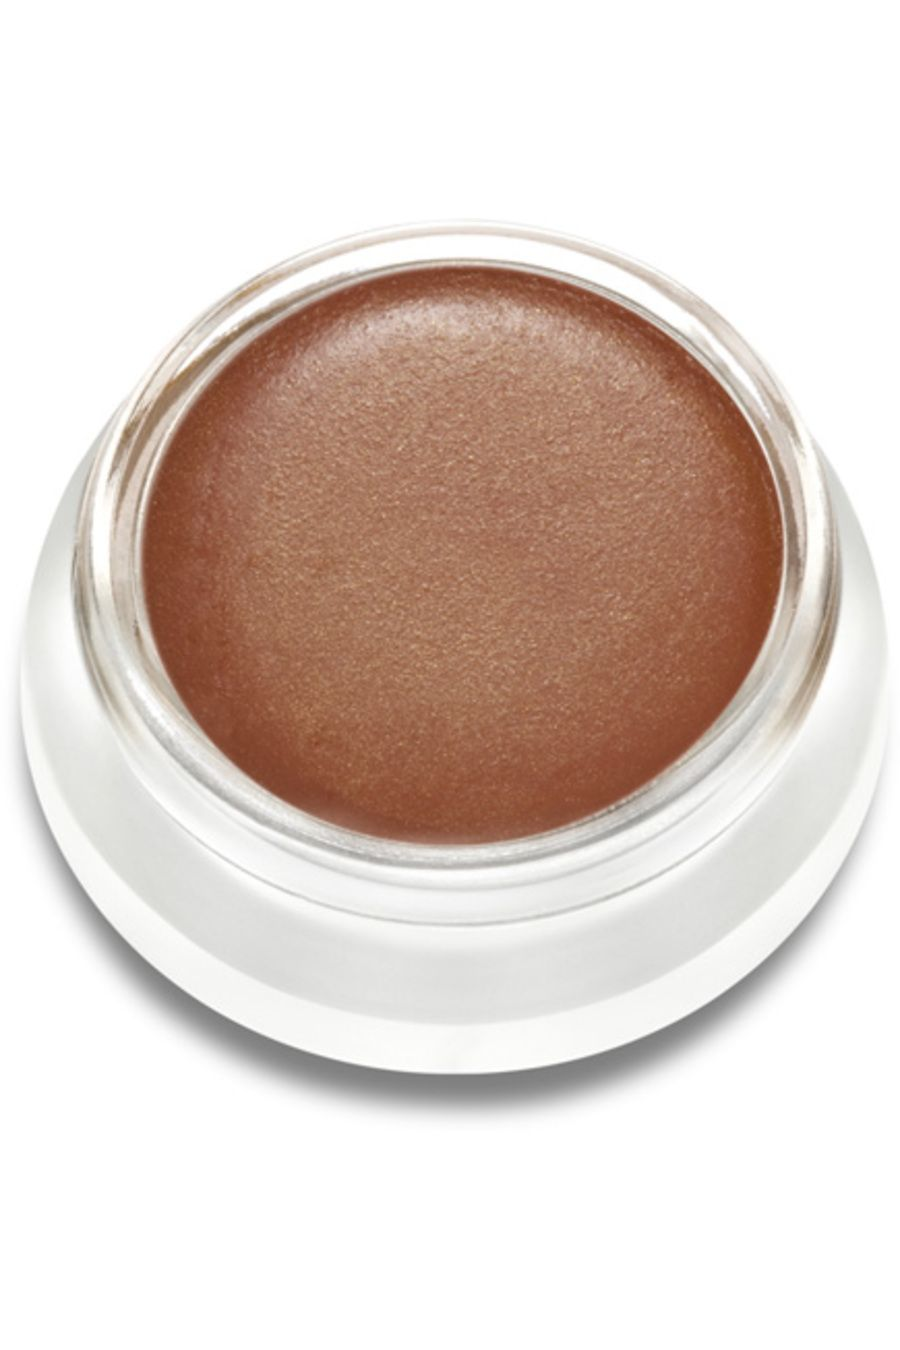 Blissim : RMS Beauty - Lip2Cheek - Promise